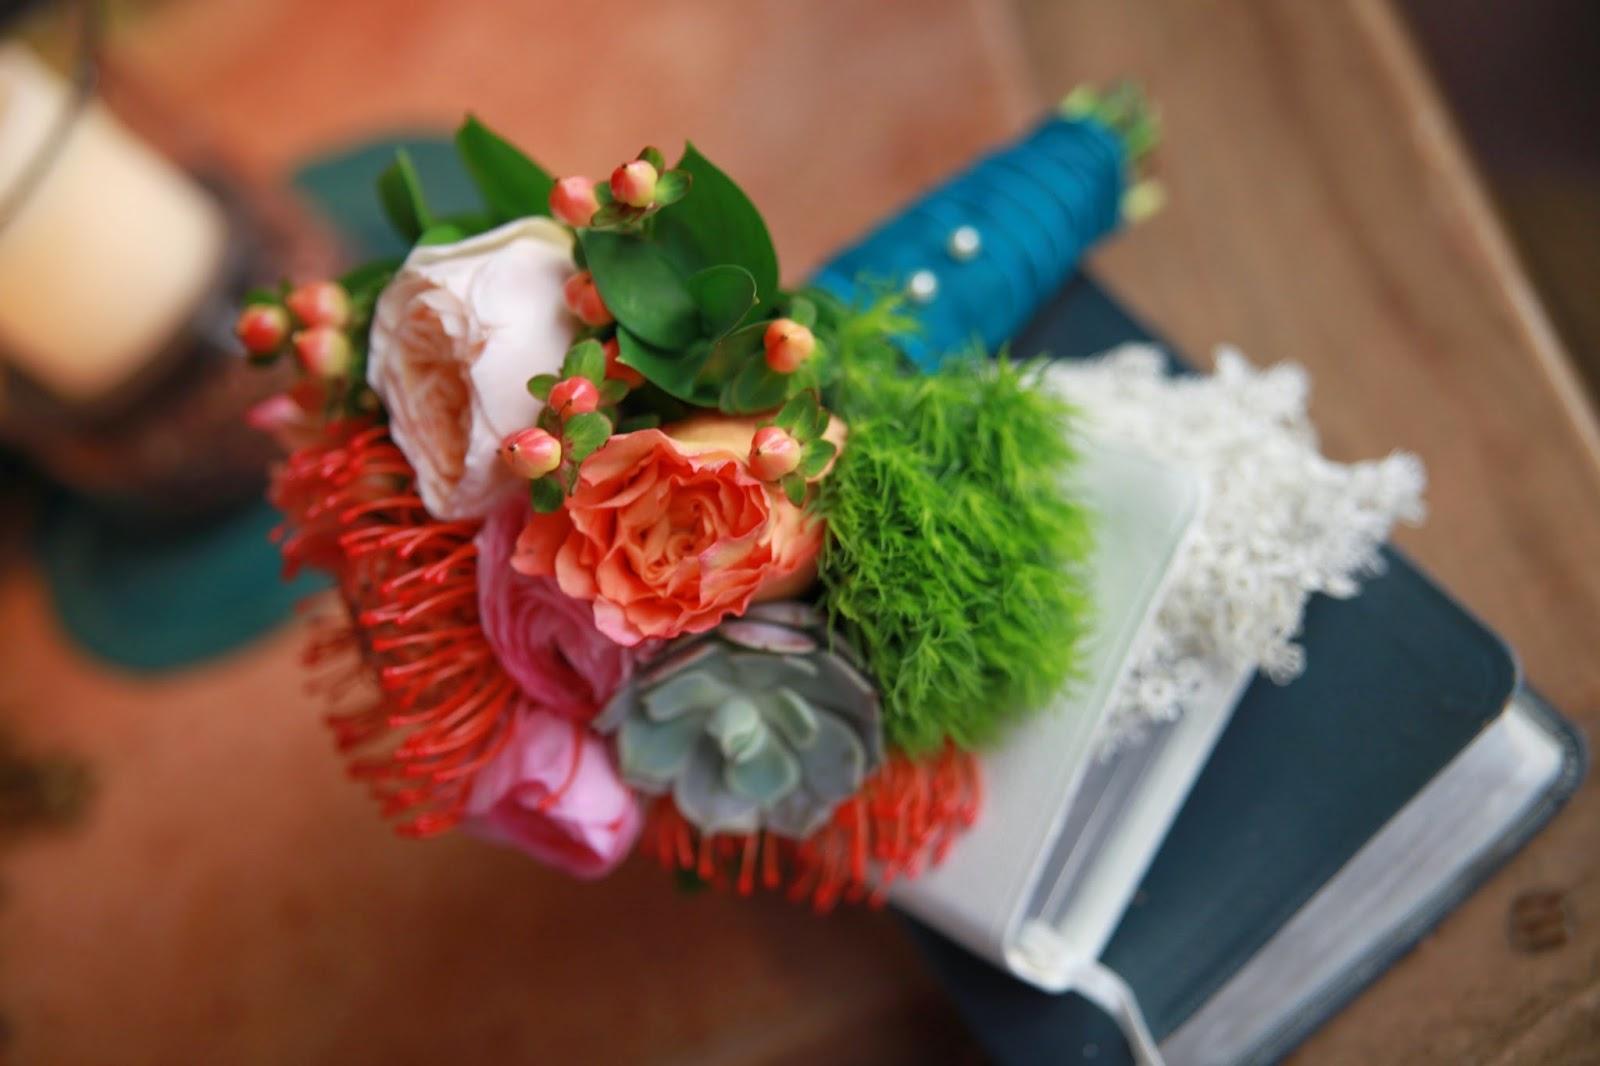 wedding flower arrangements, bridal bouquets, flowers for wedding